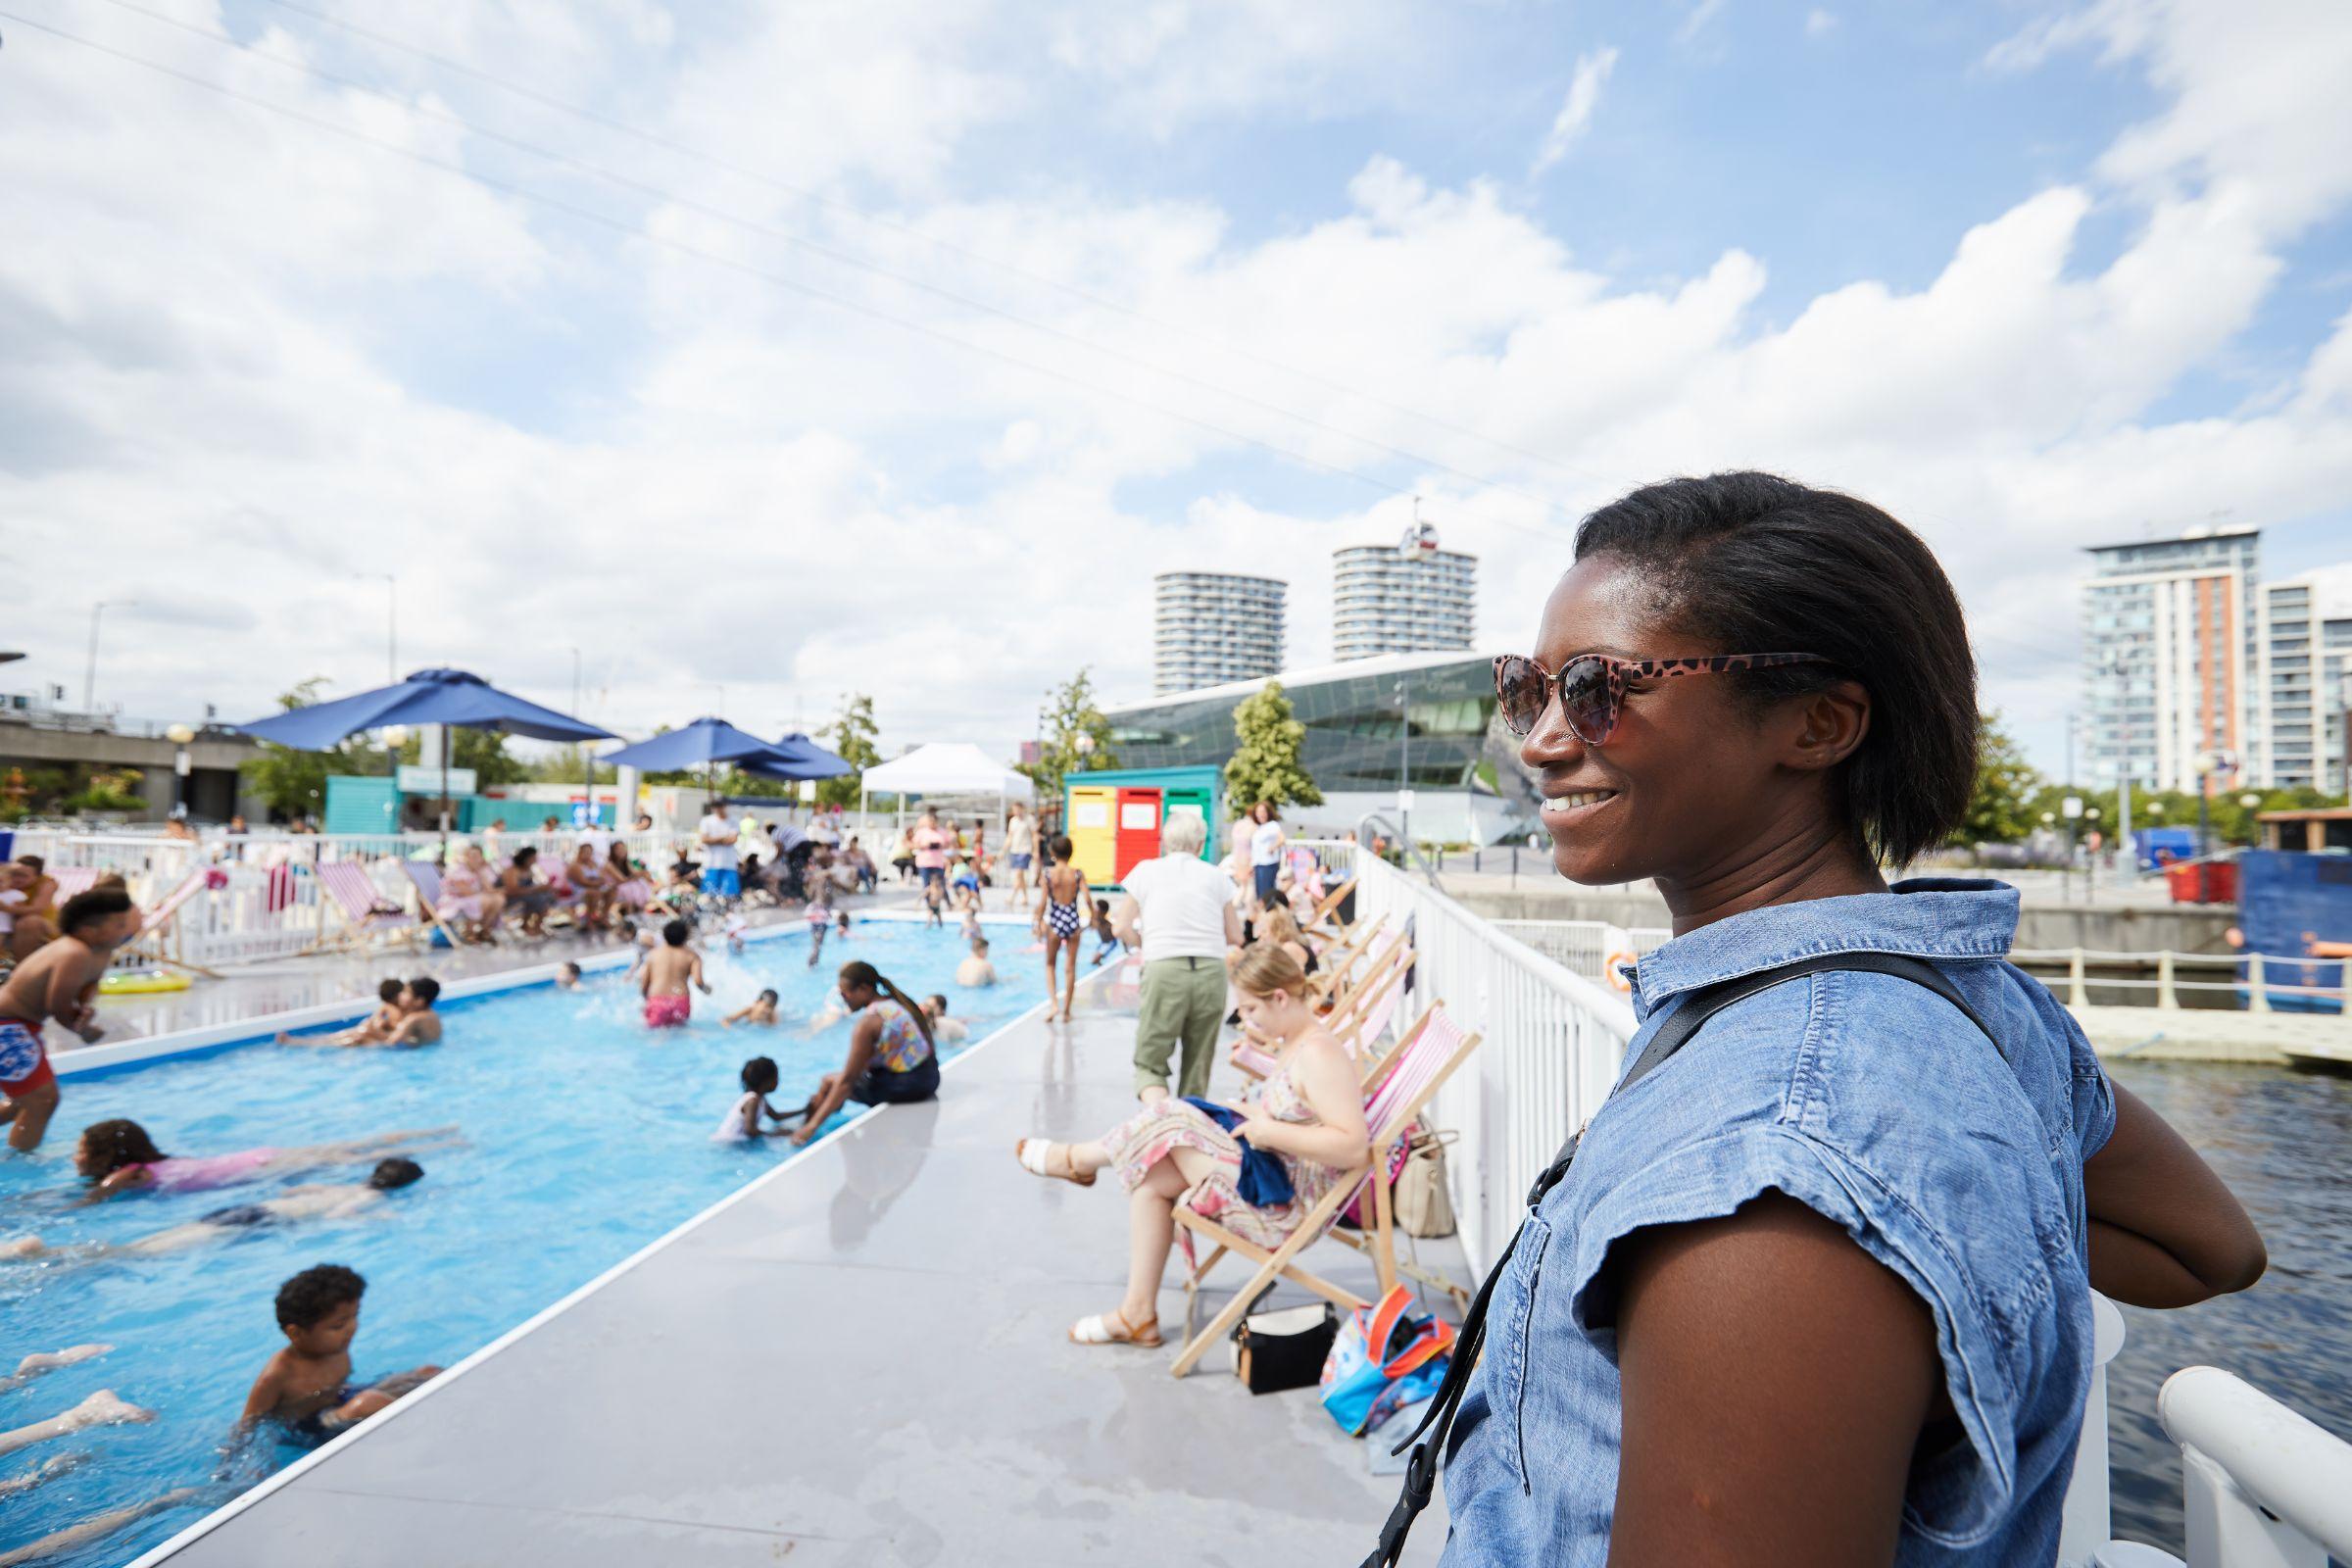 Attendees enjoying the Royal Docks paddling pool